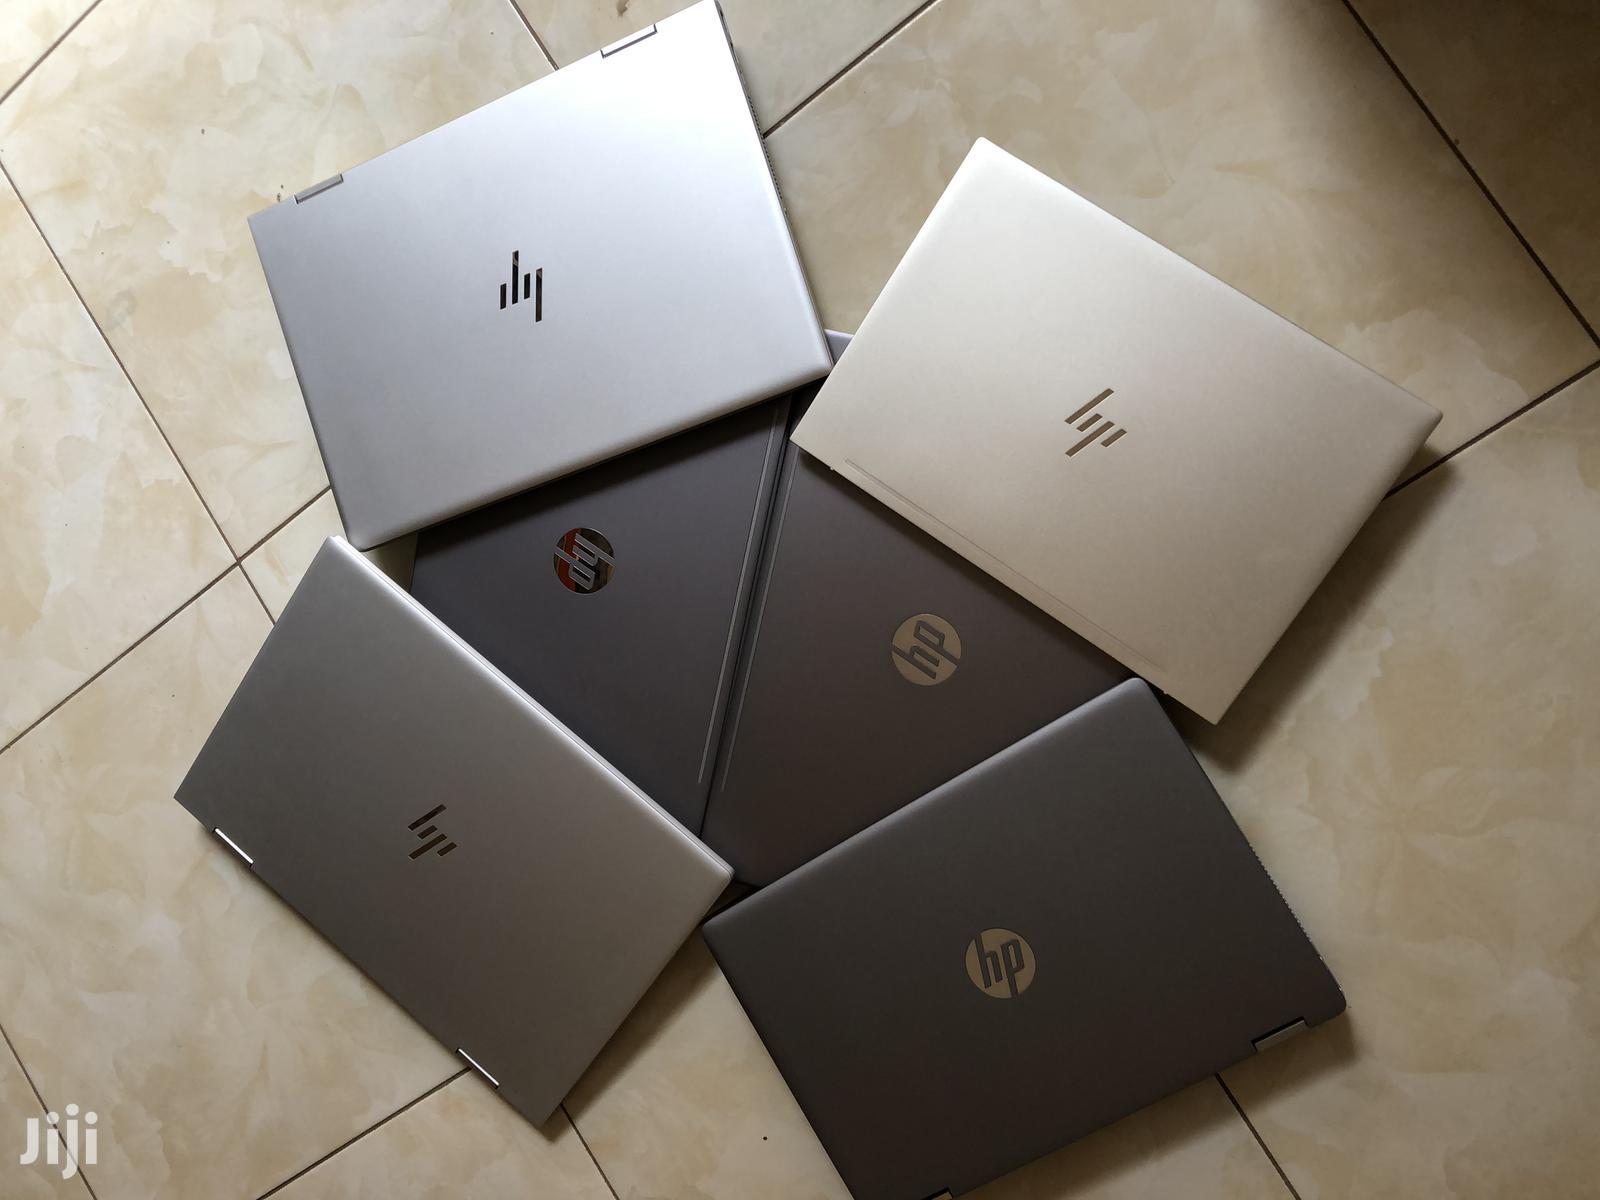 New Laptop HP Envy 15t 8GB Intel Core I5 SSHD (Hybrid) 512GB